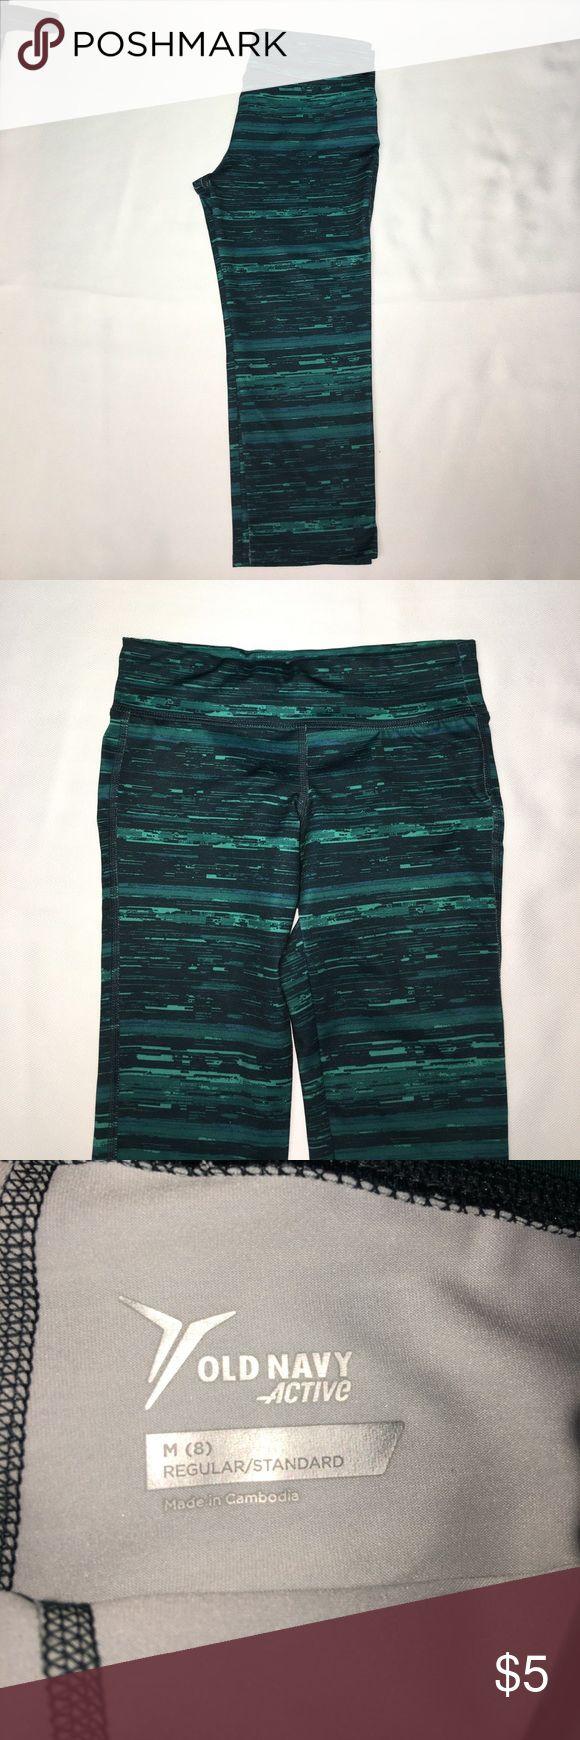 Old Navy leggings (M 8) (0067) Old Navy leggings (M 8) (0067) .... MAKE A BUNDLE!!! Old Navy Bottoms Leggings